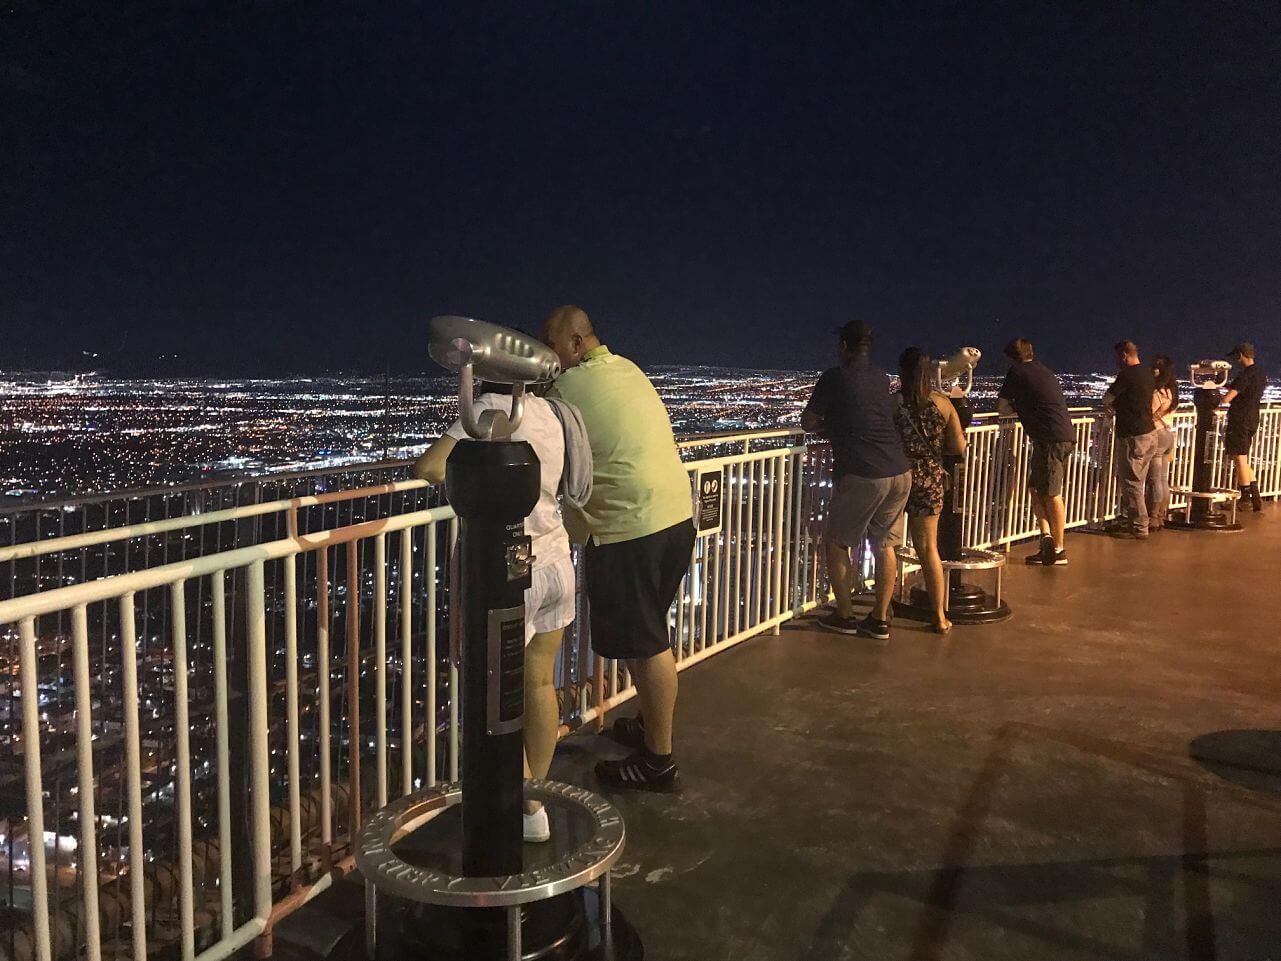 The Strat Observation Deck in Las Vegas